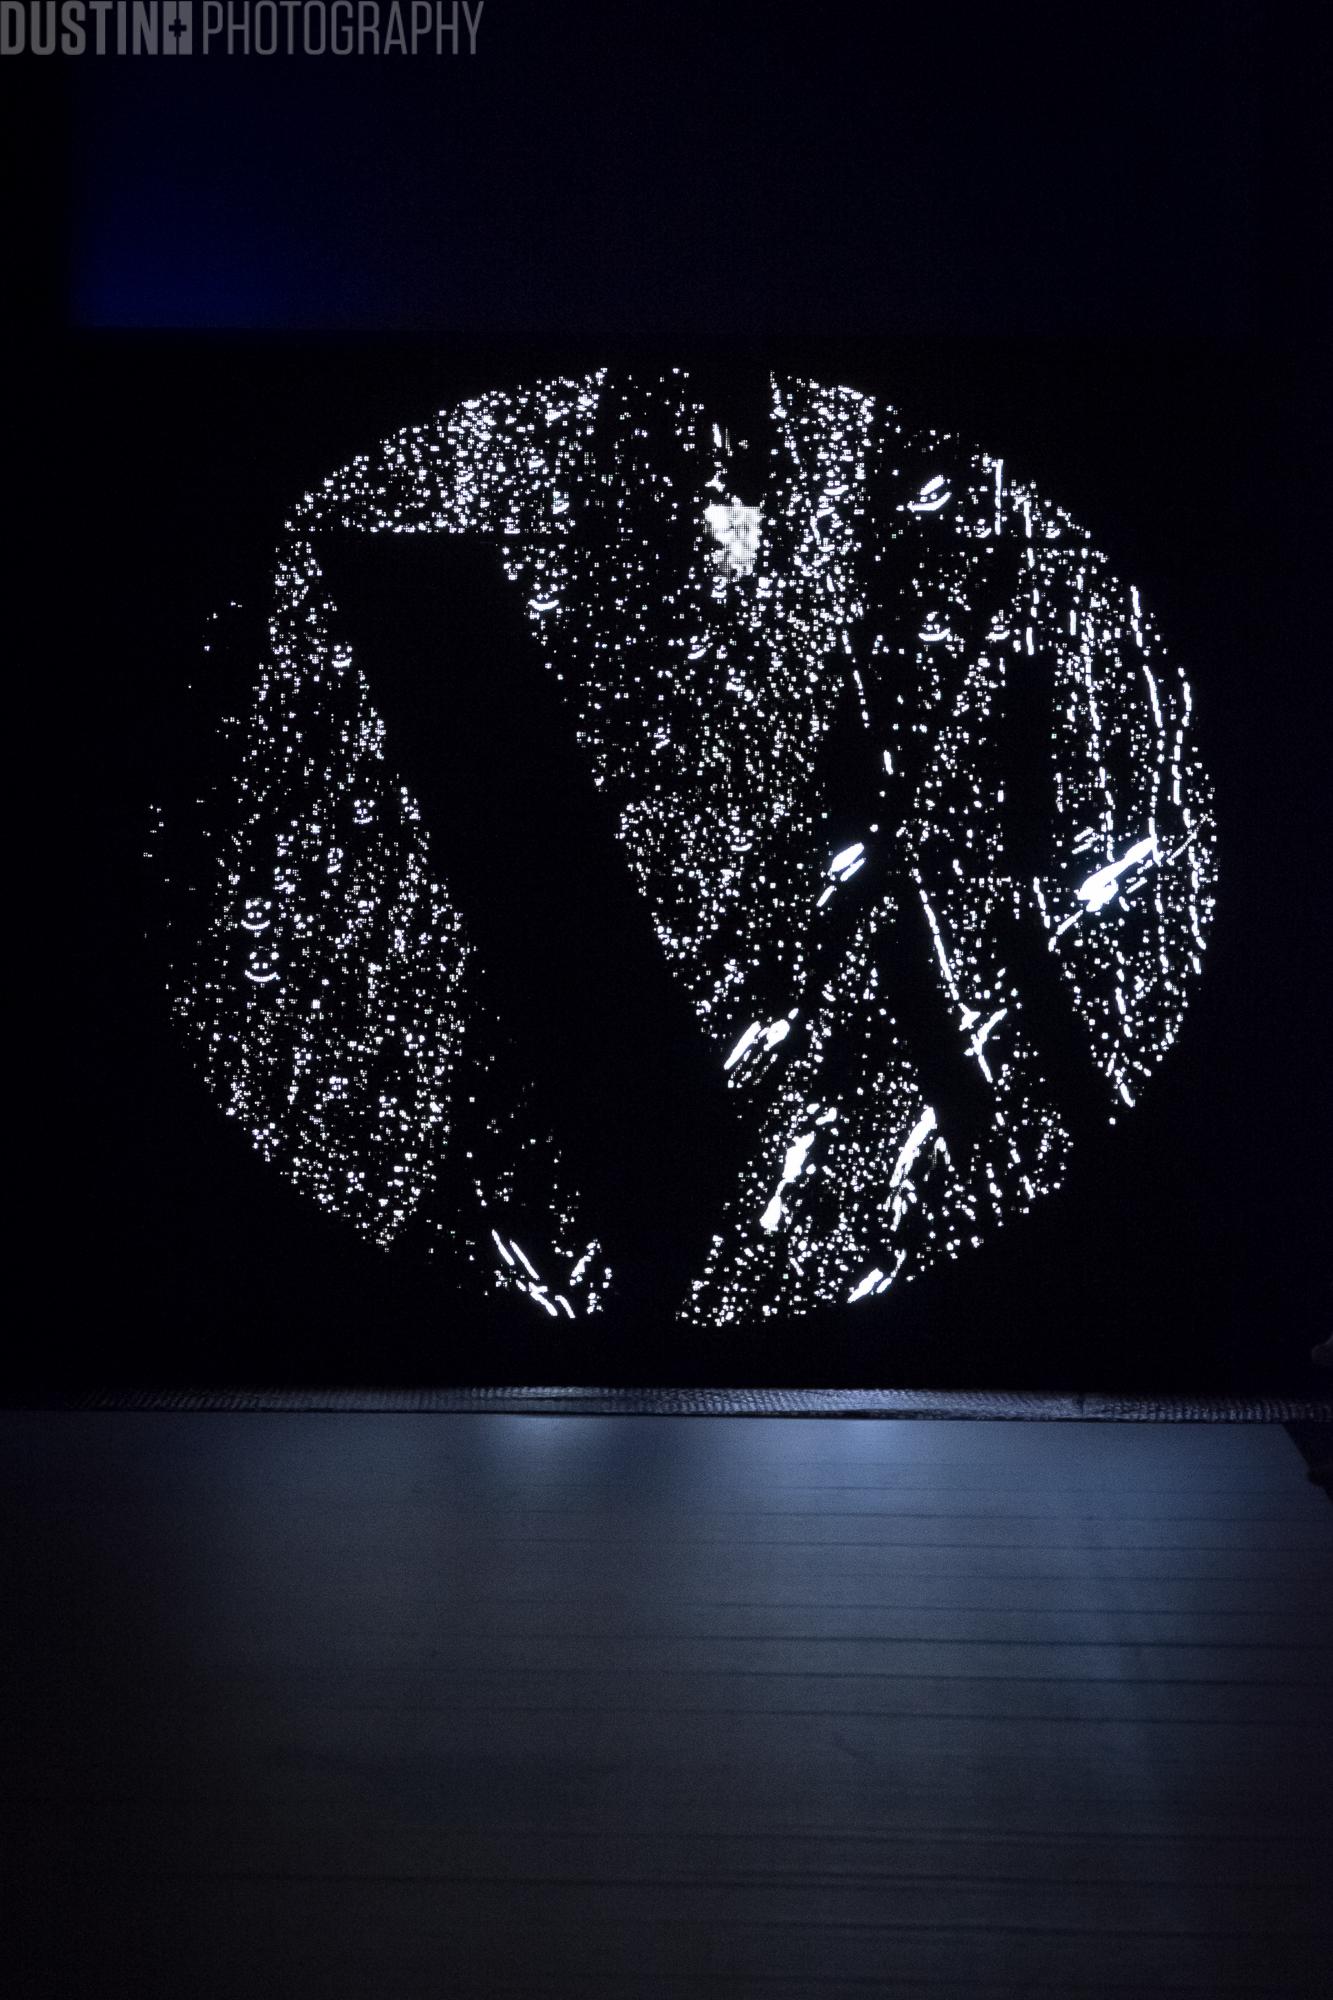 2017 3-25 VFWFW17 - logo-14478.jpg